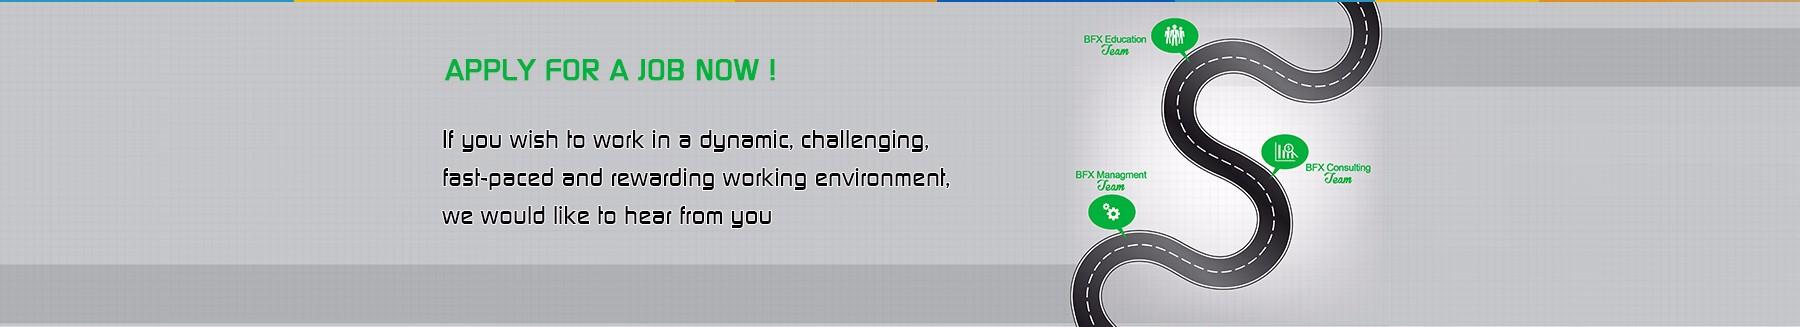 Careers-bfx9